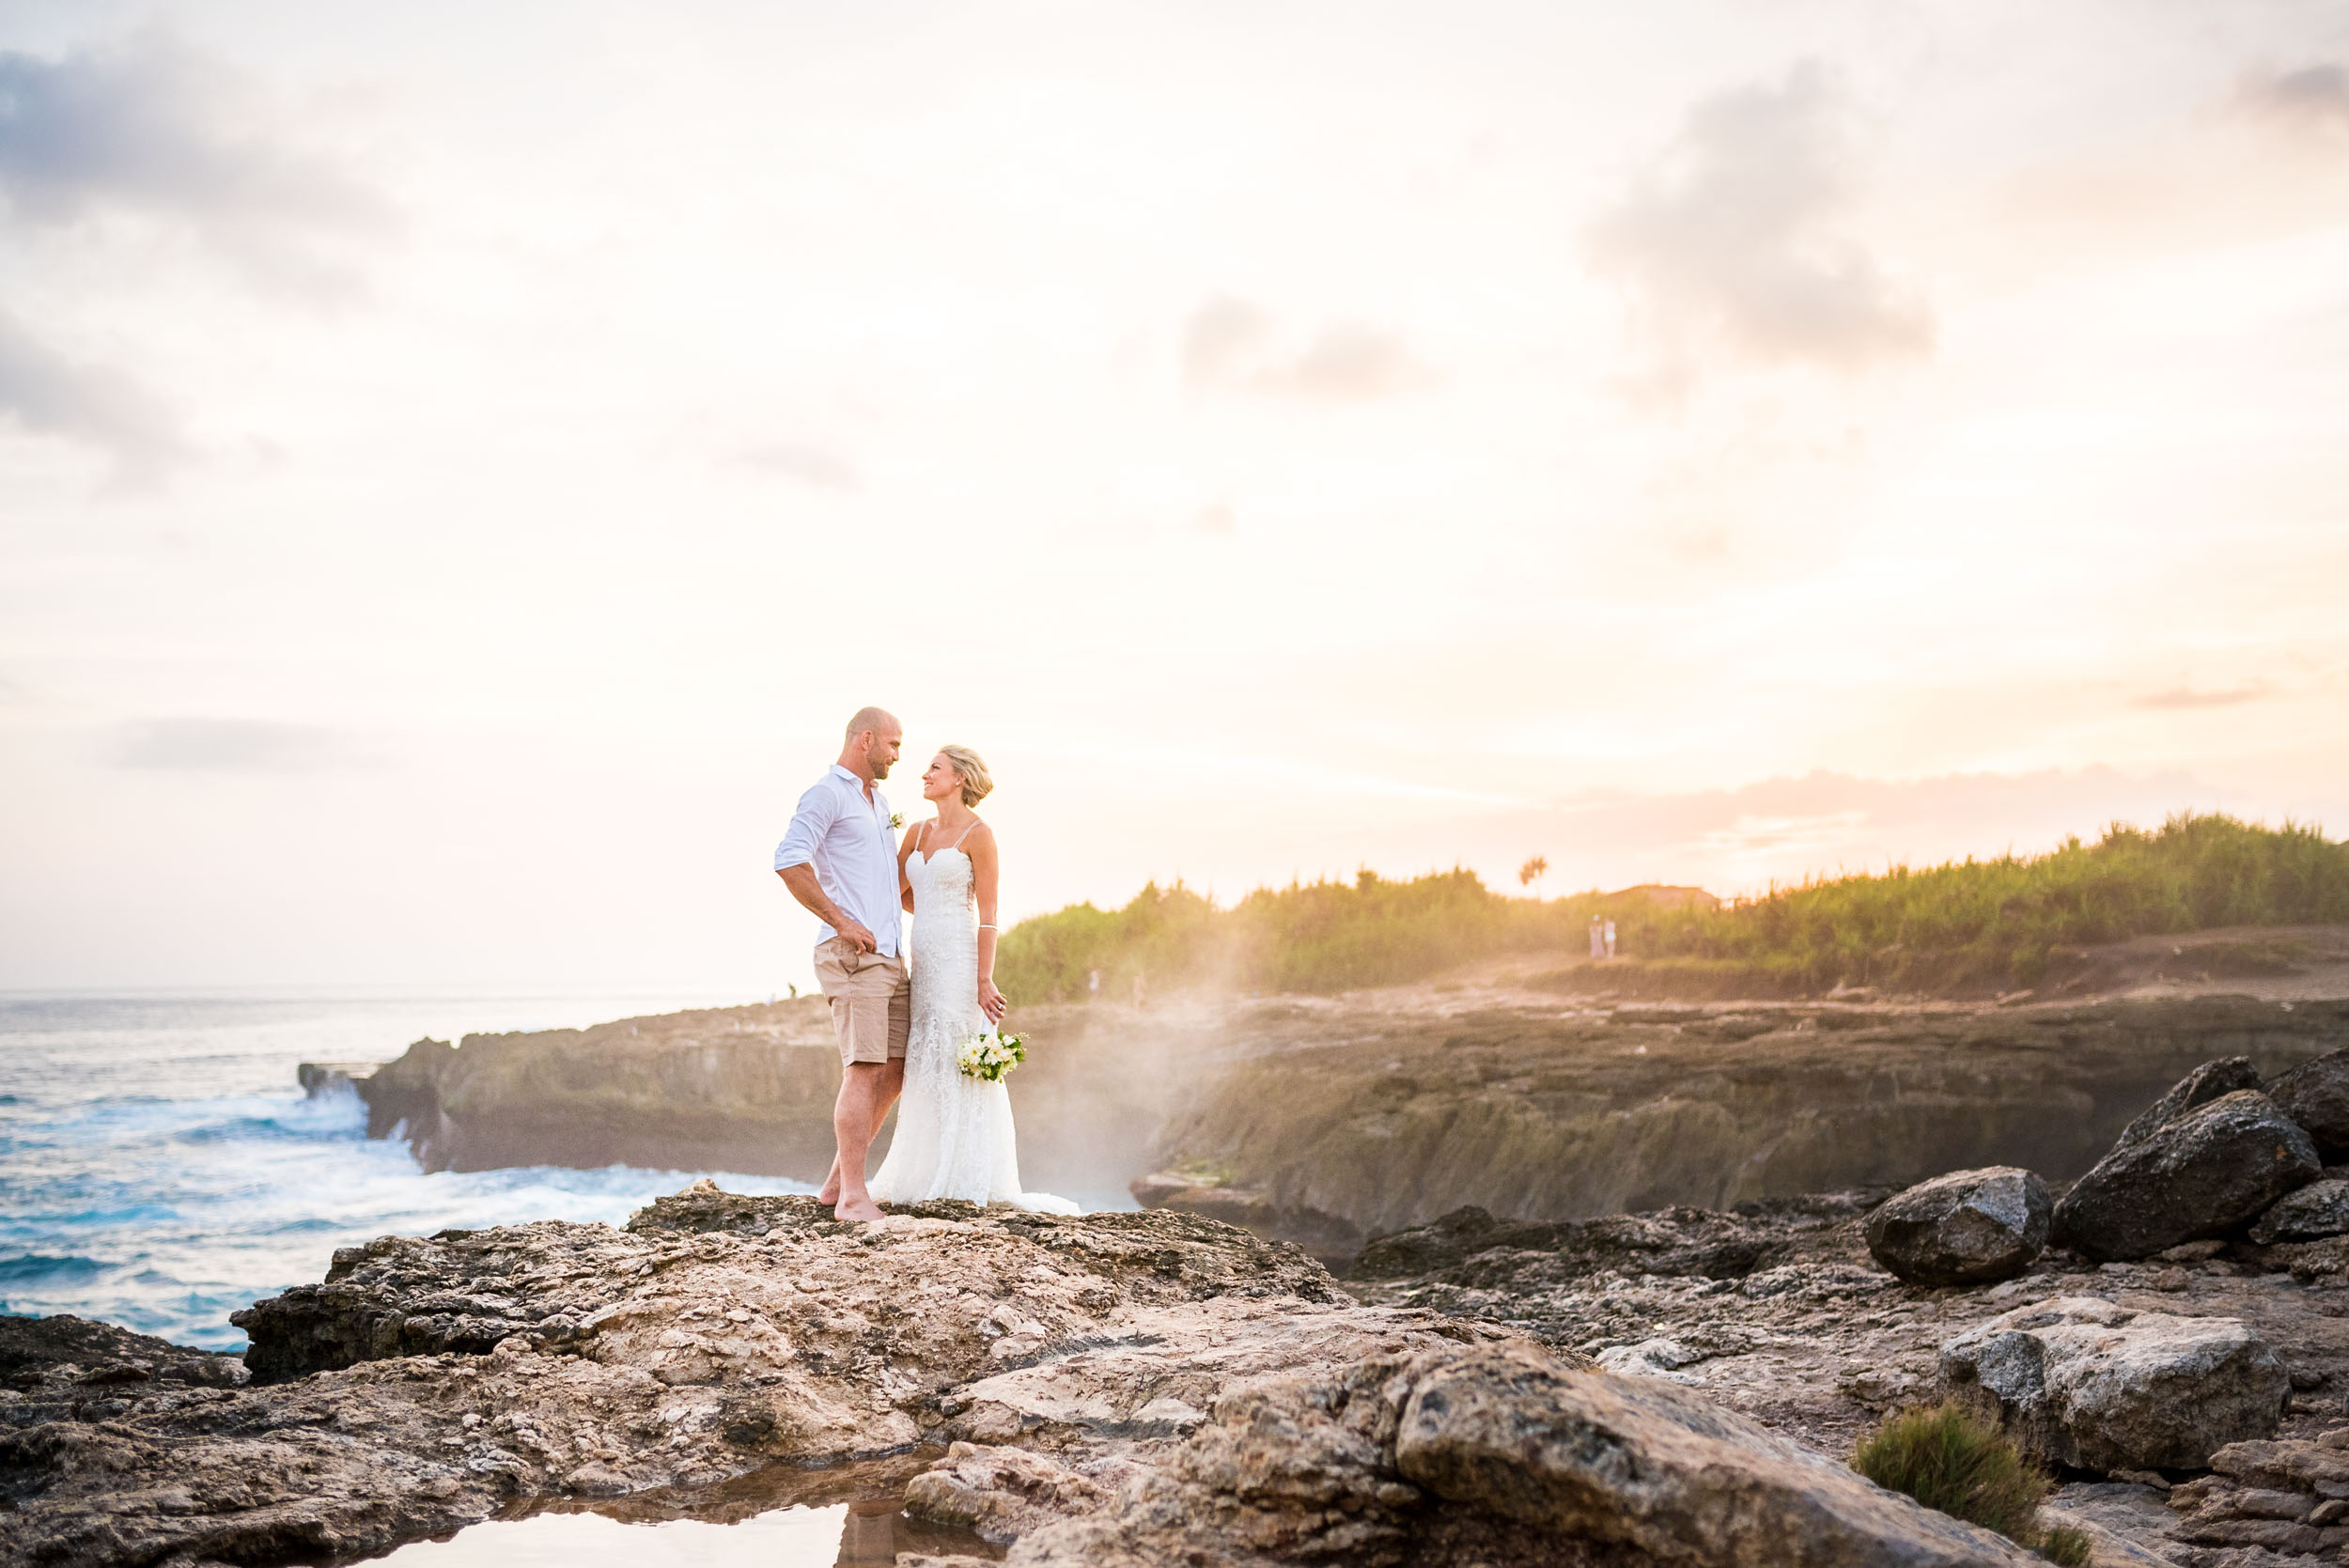 The Raw Photographer - Cairns Wedding Photographer - Bali Ubud Destination Photography - Travel - Australia - Asia Wed Photo Portrait-10.jpg